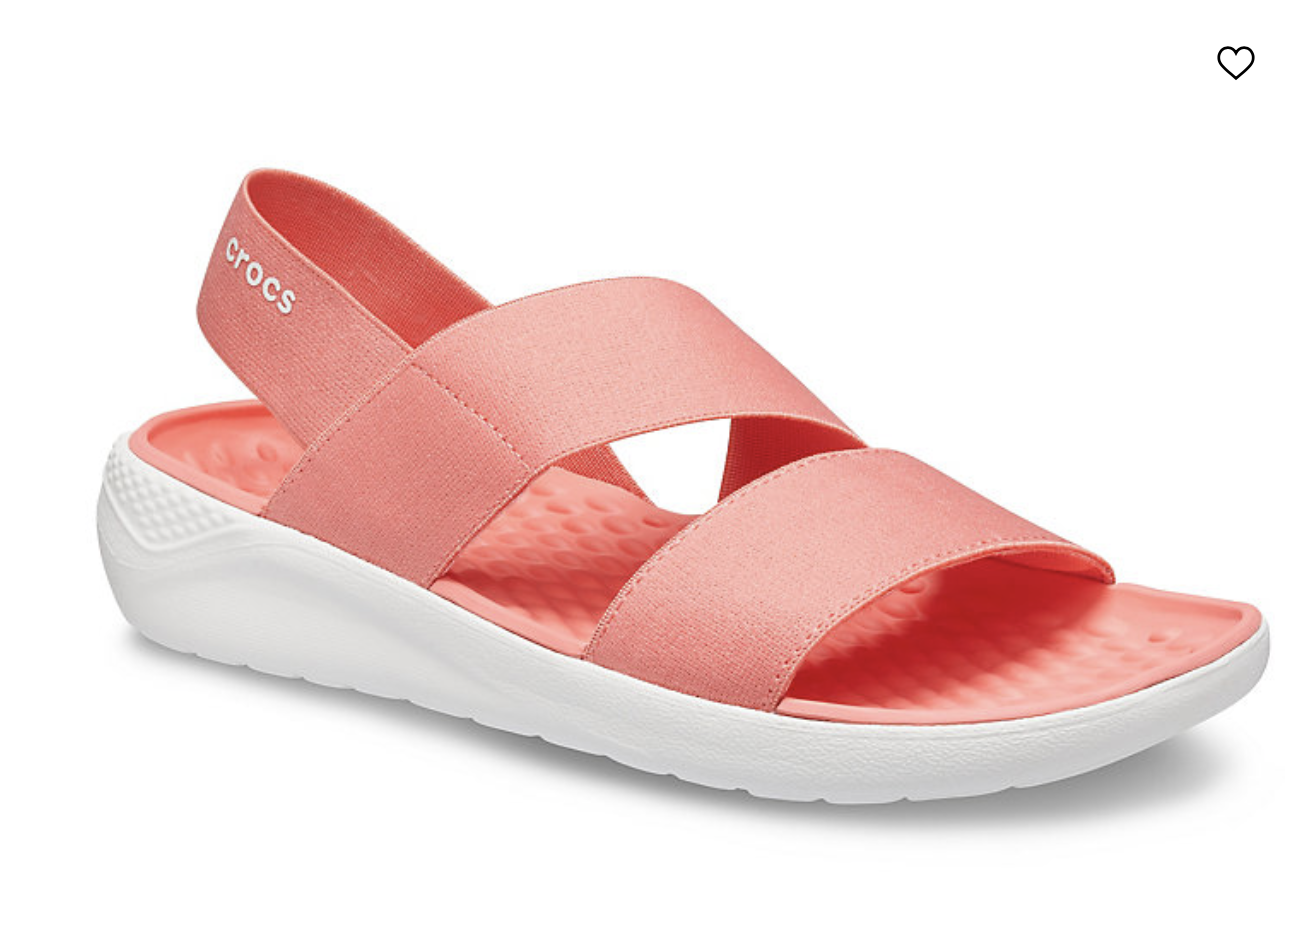 Crocs: Up to 60% off sale.